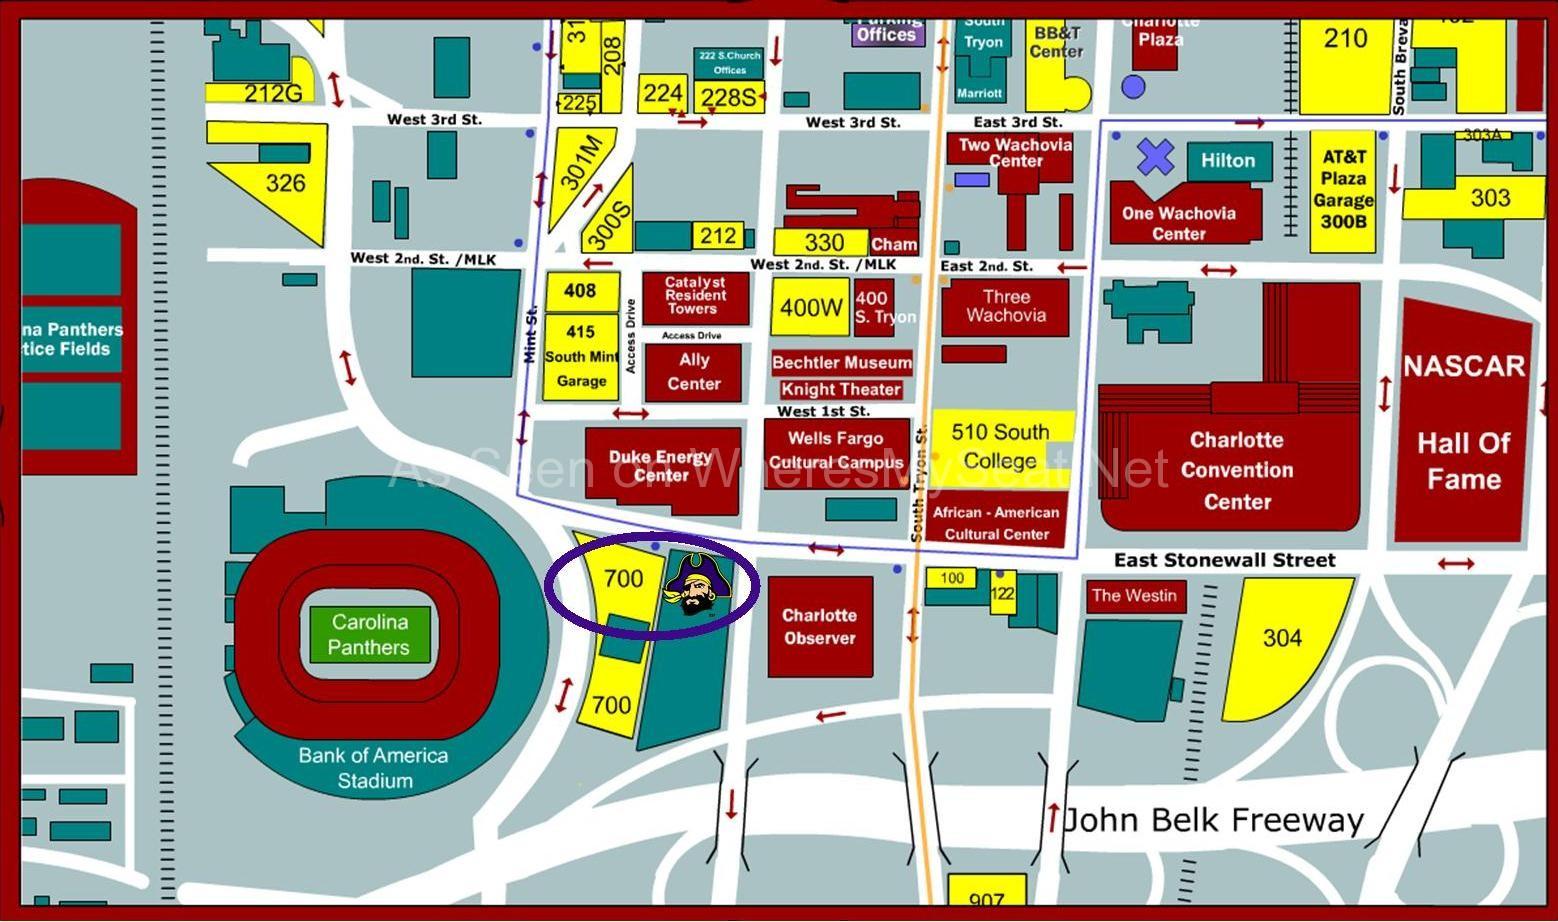 Bank of America Stadium Parking Map Bank of America Stadium, Charlotte NC